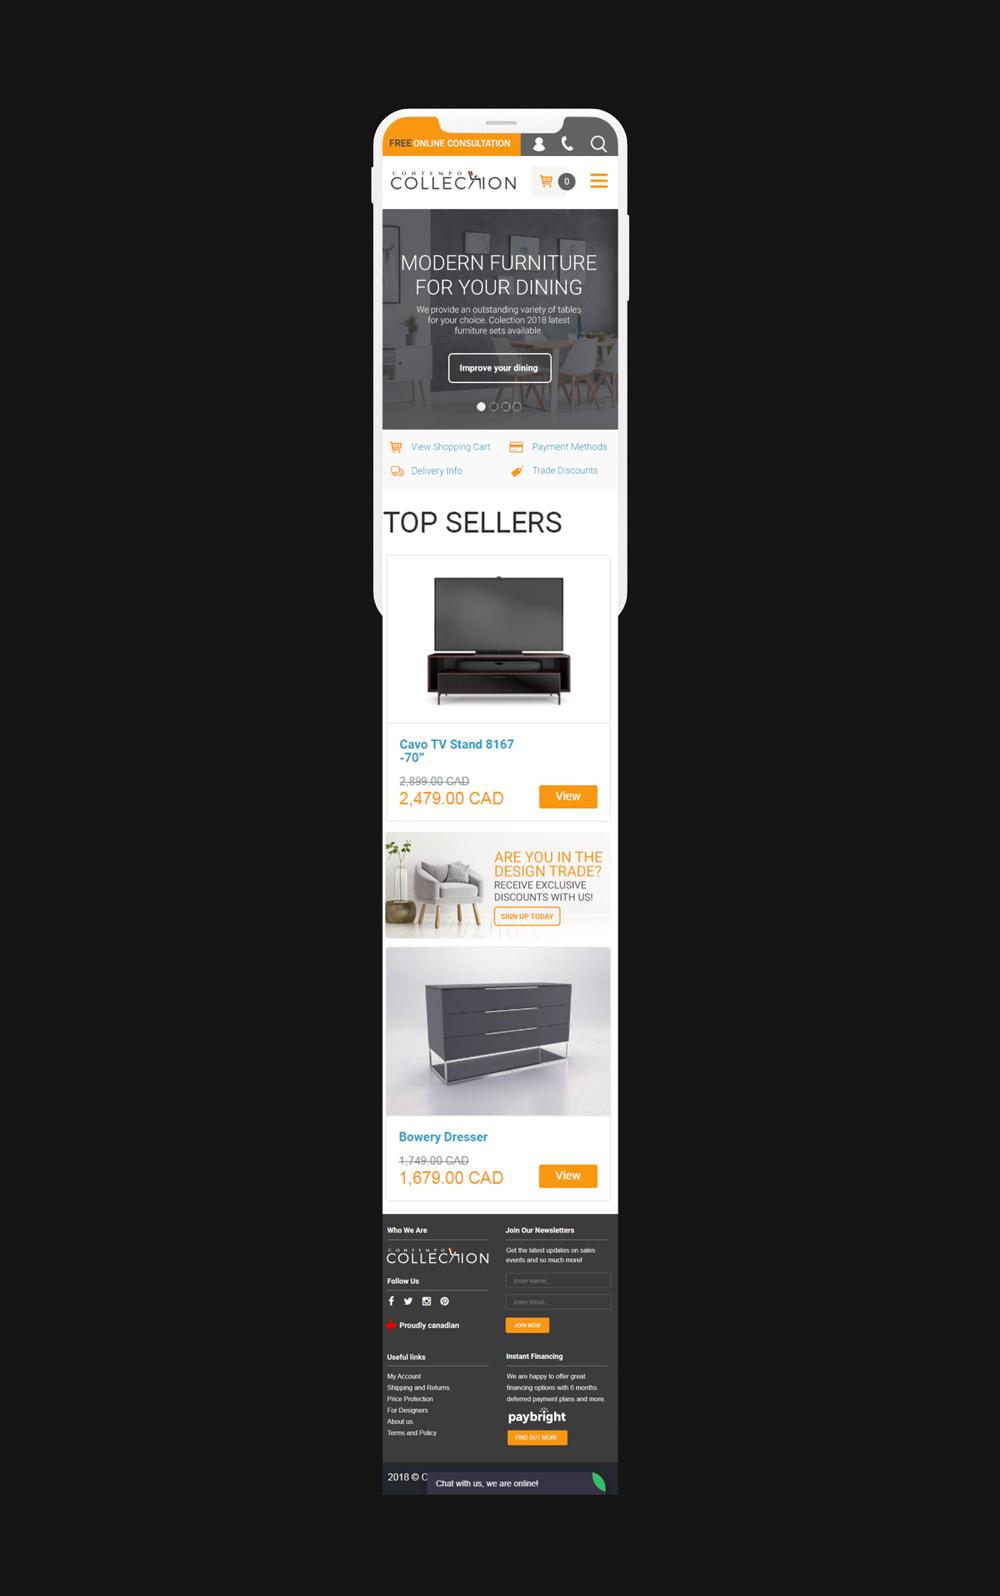 magasin-meubles-site-mobile-arttractiv